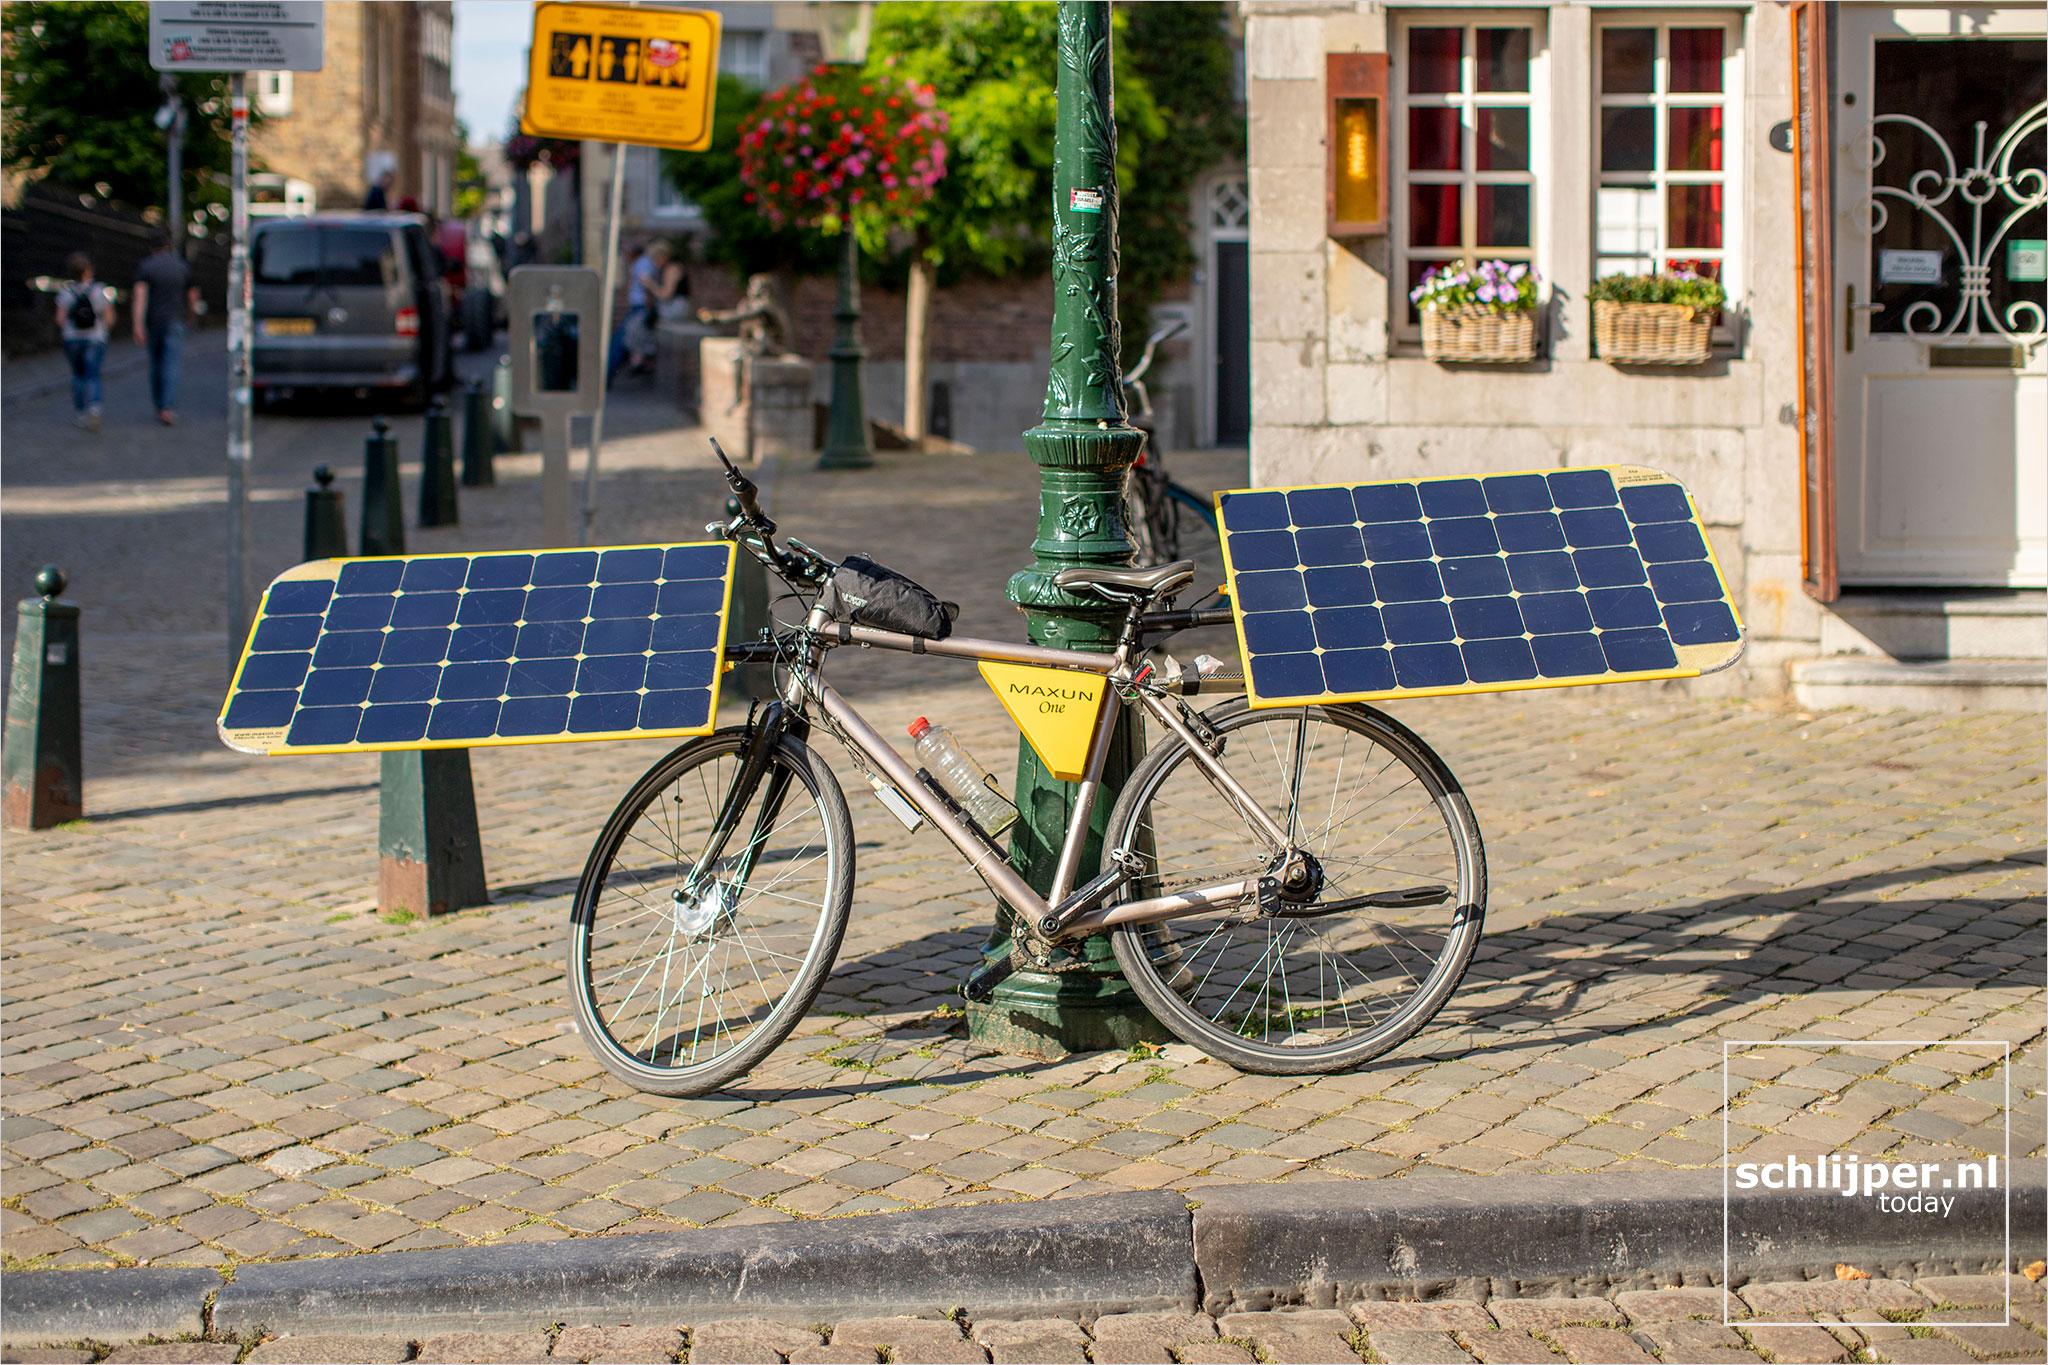 The Netherlands, Maastricht, 7 september 2021